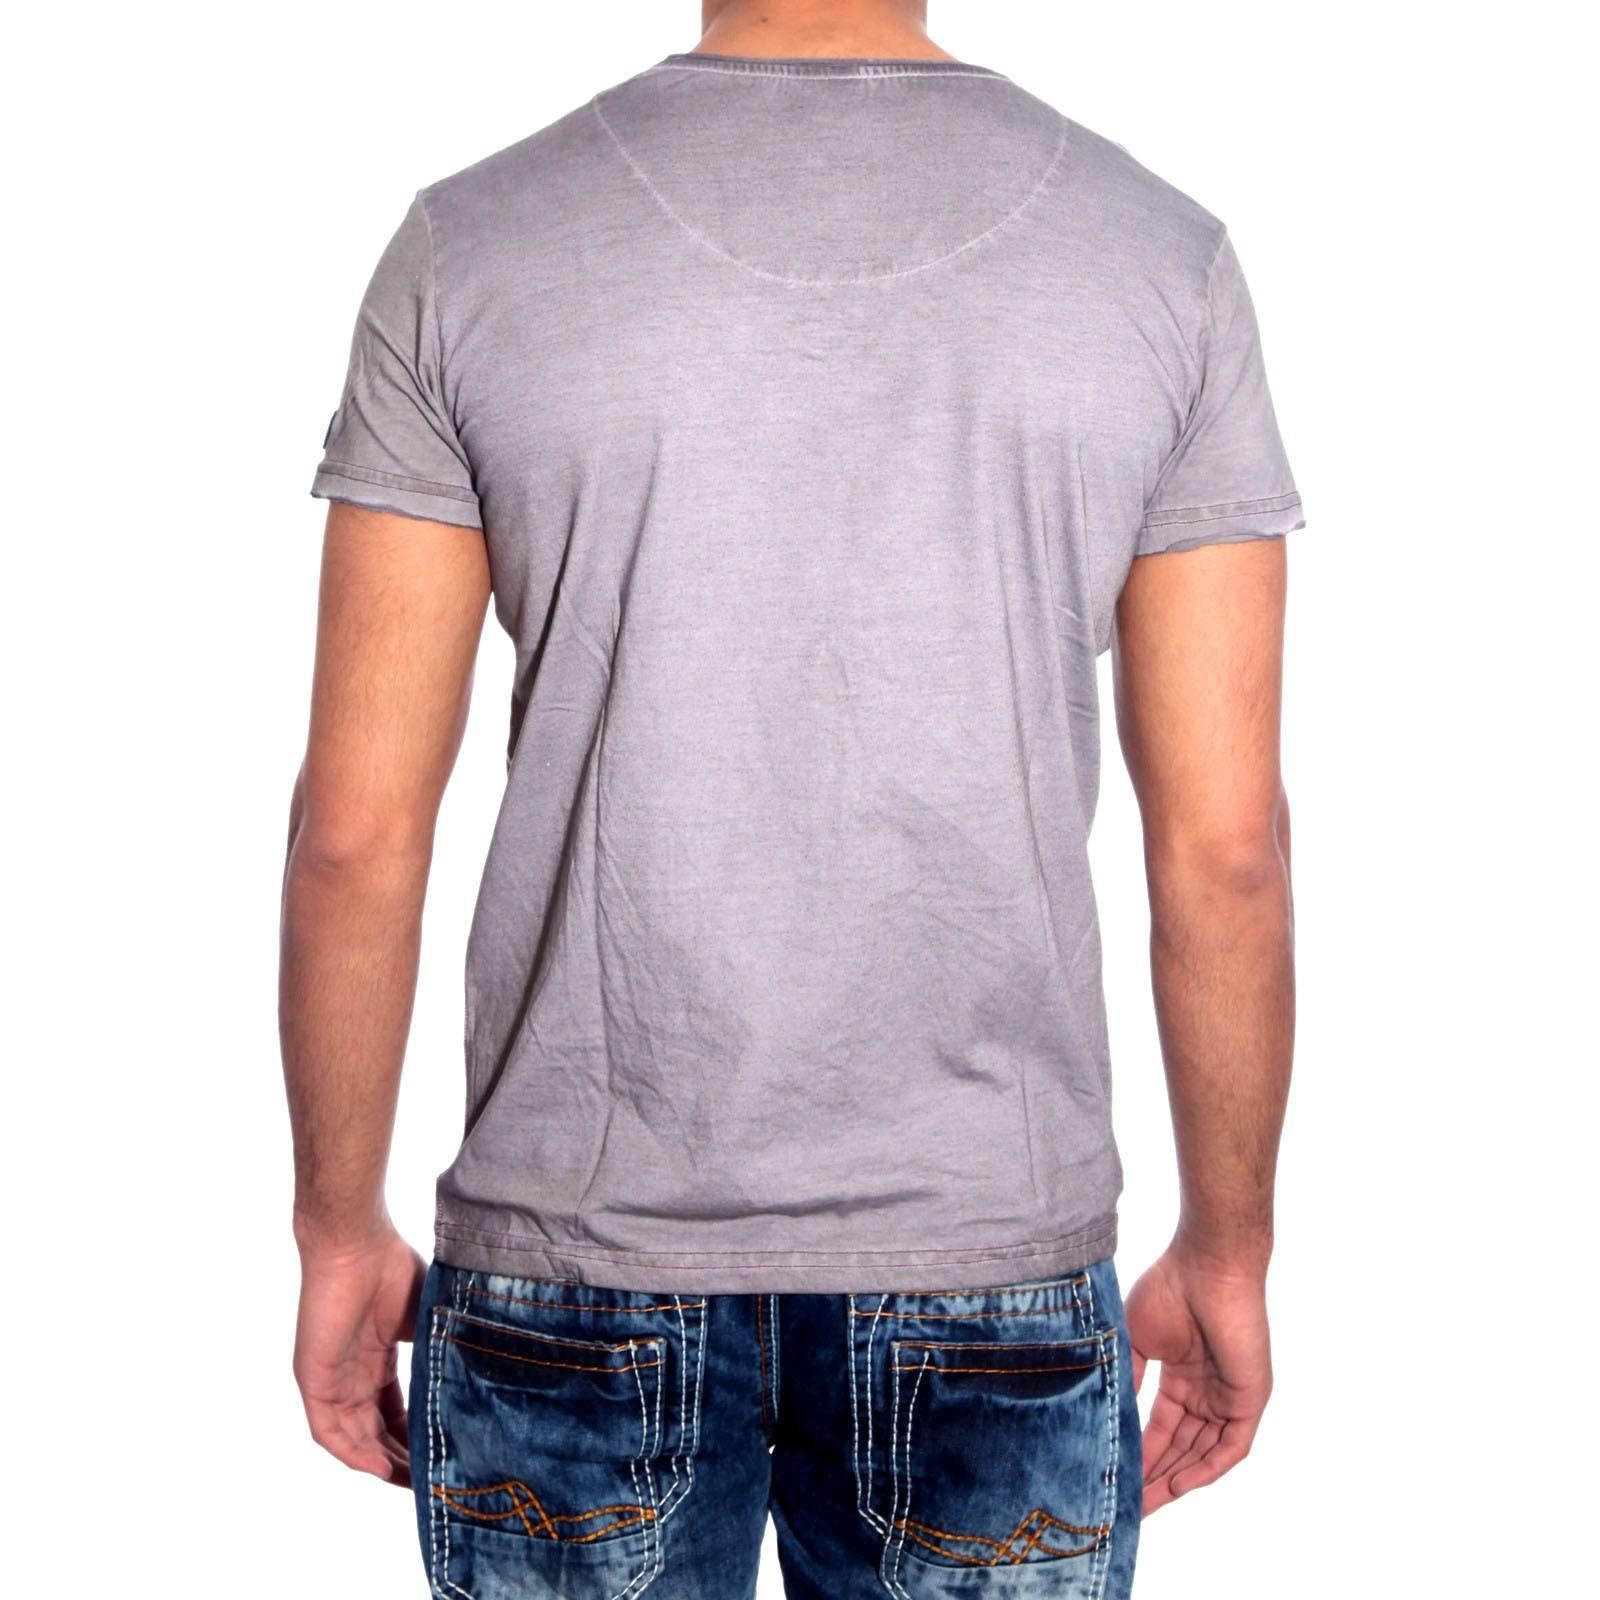 T-Shirt Grau 6640 R-Neal